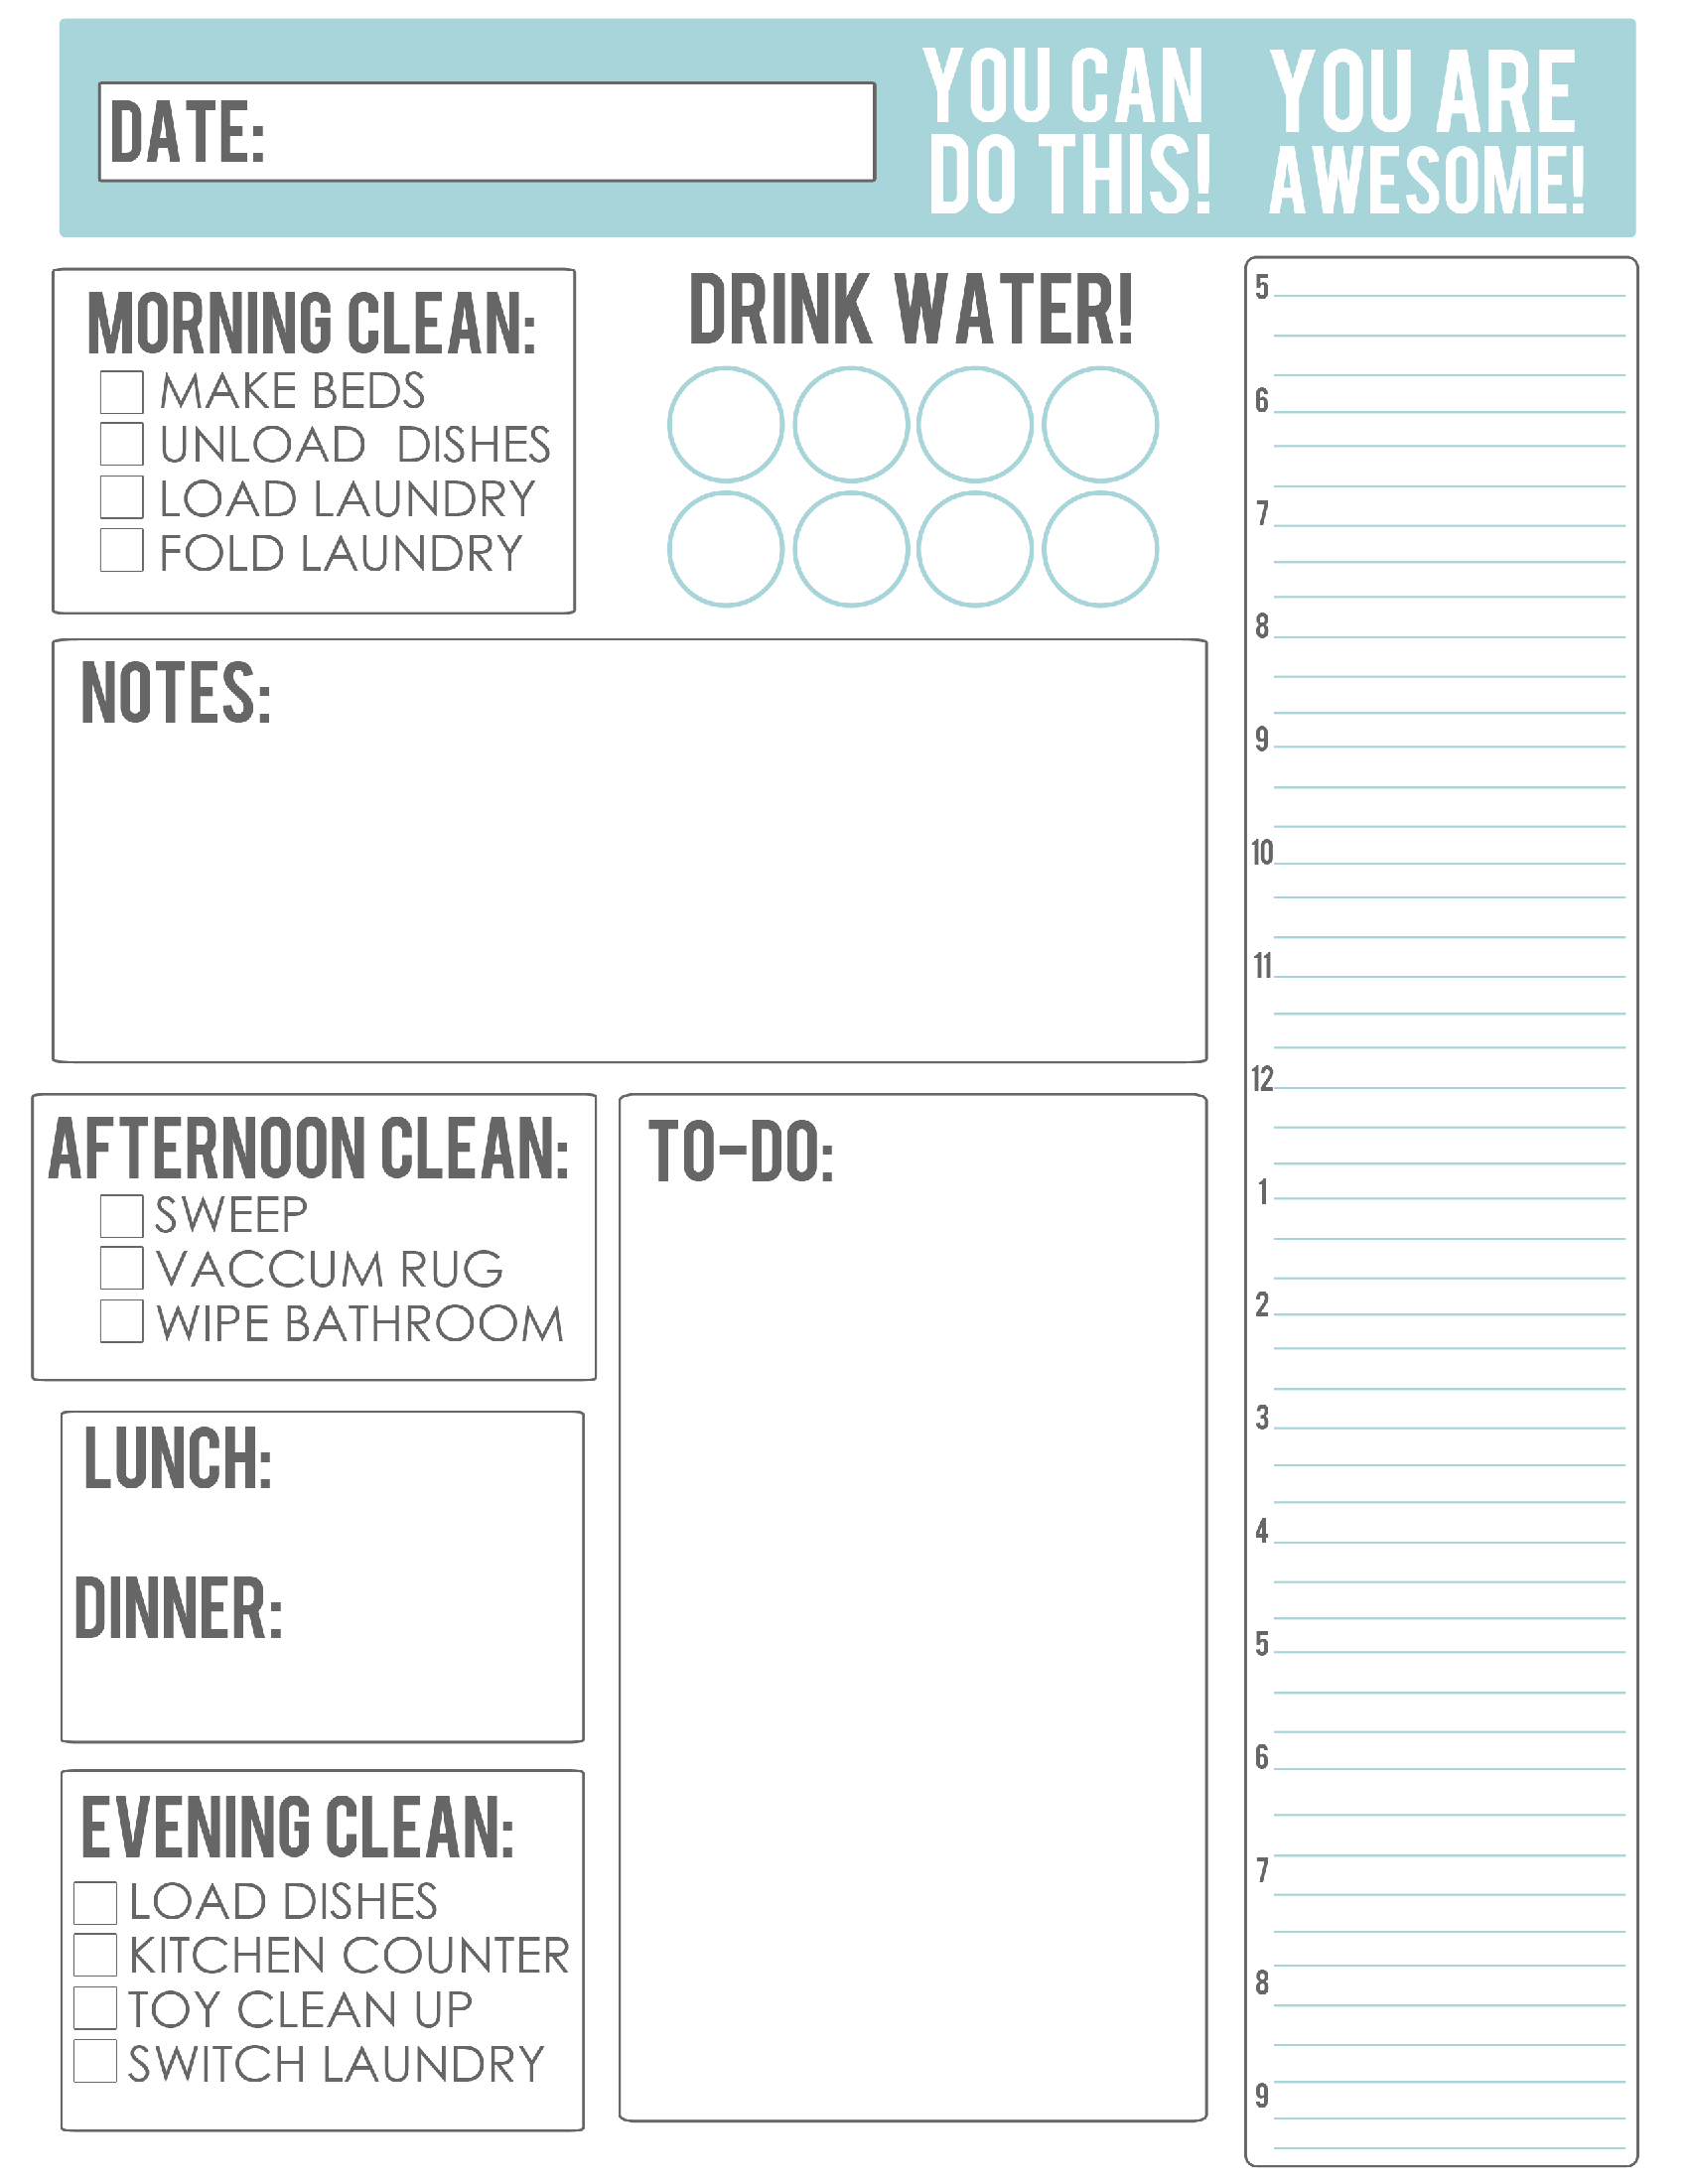 Thebusybudgetingmama Daily Schedule